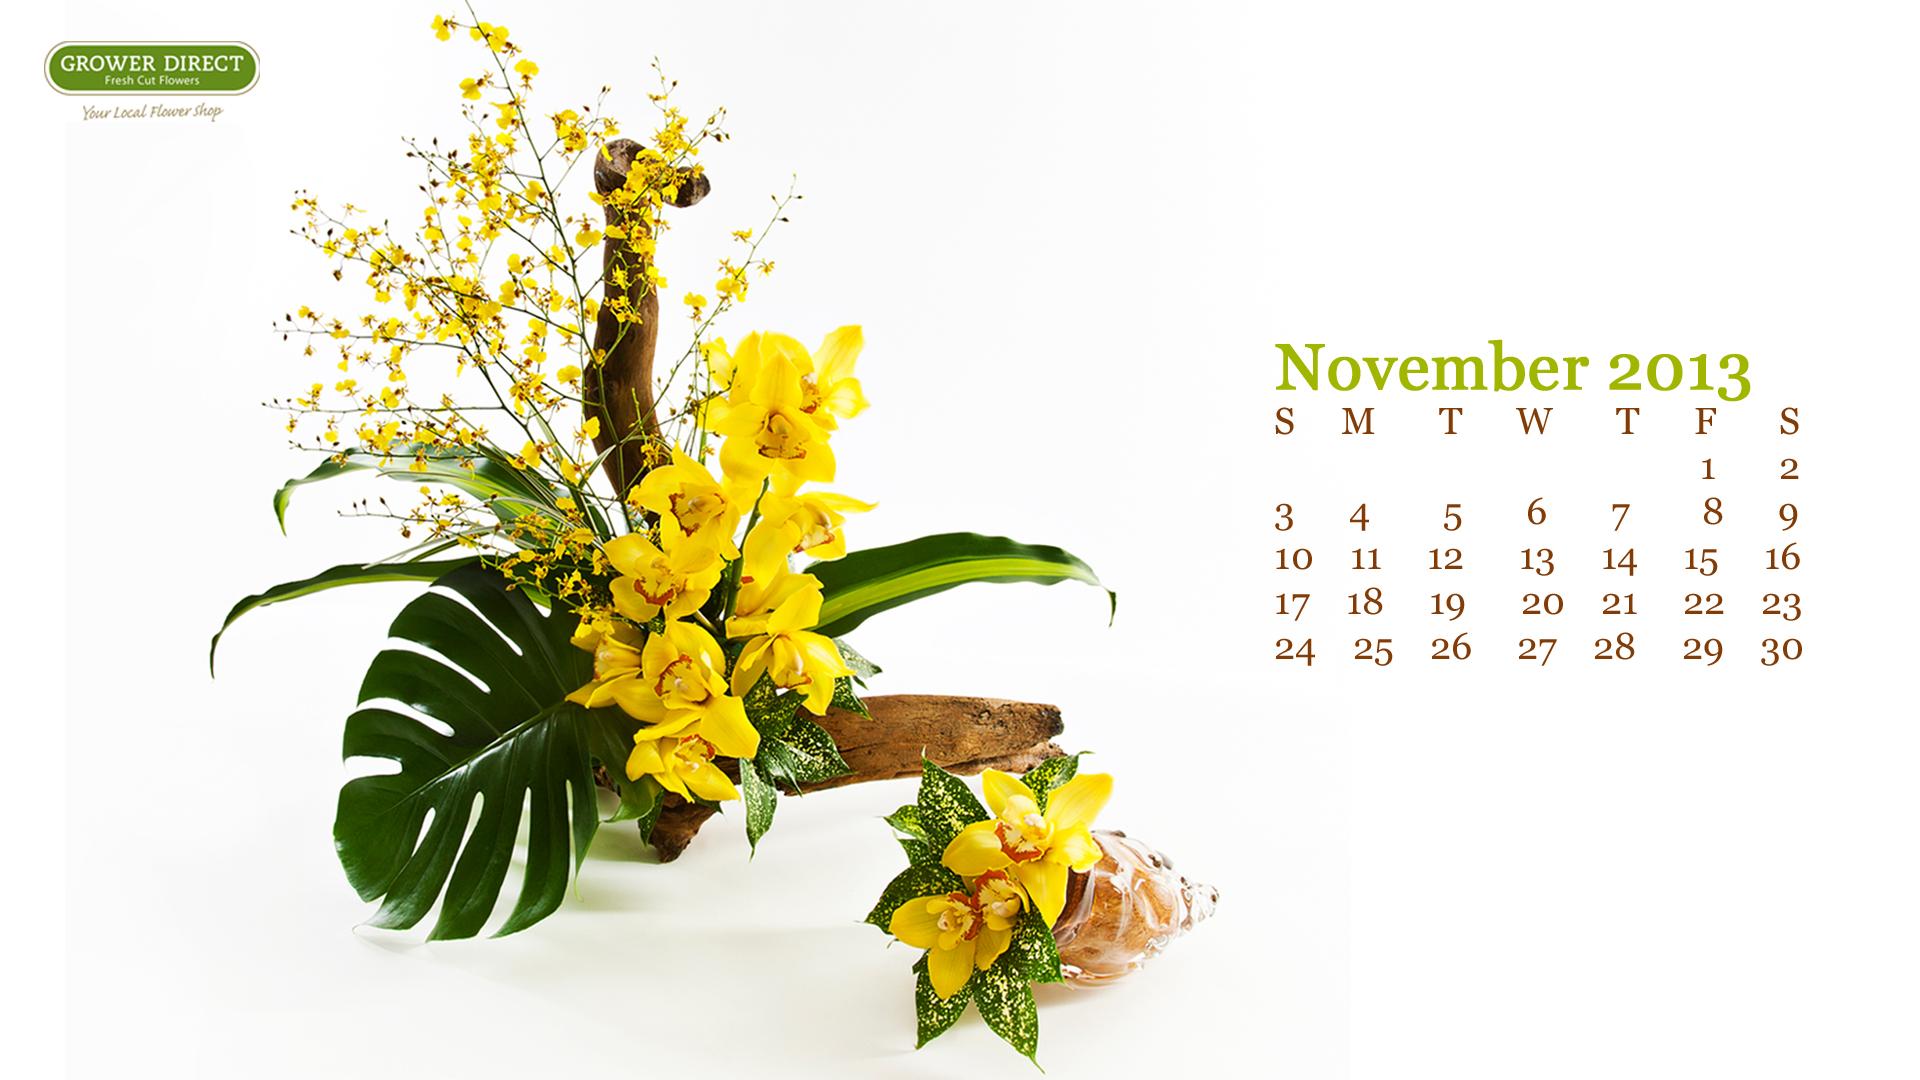 november 2013 free - photo #29